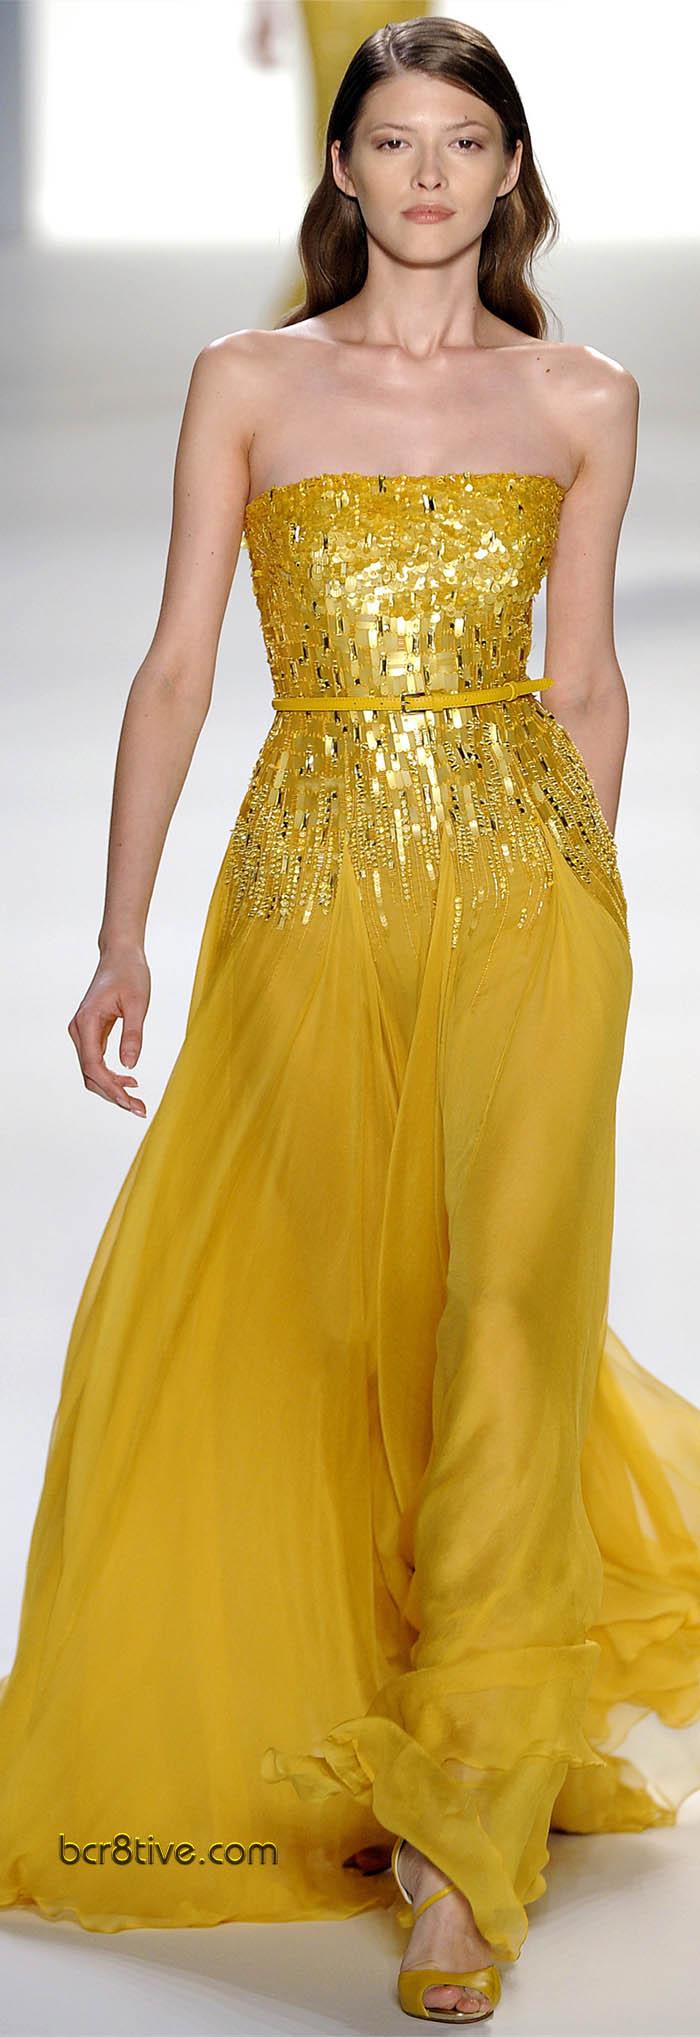 Elie Saab Spring 2014 Ready to Wear